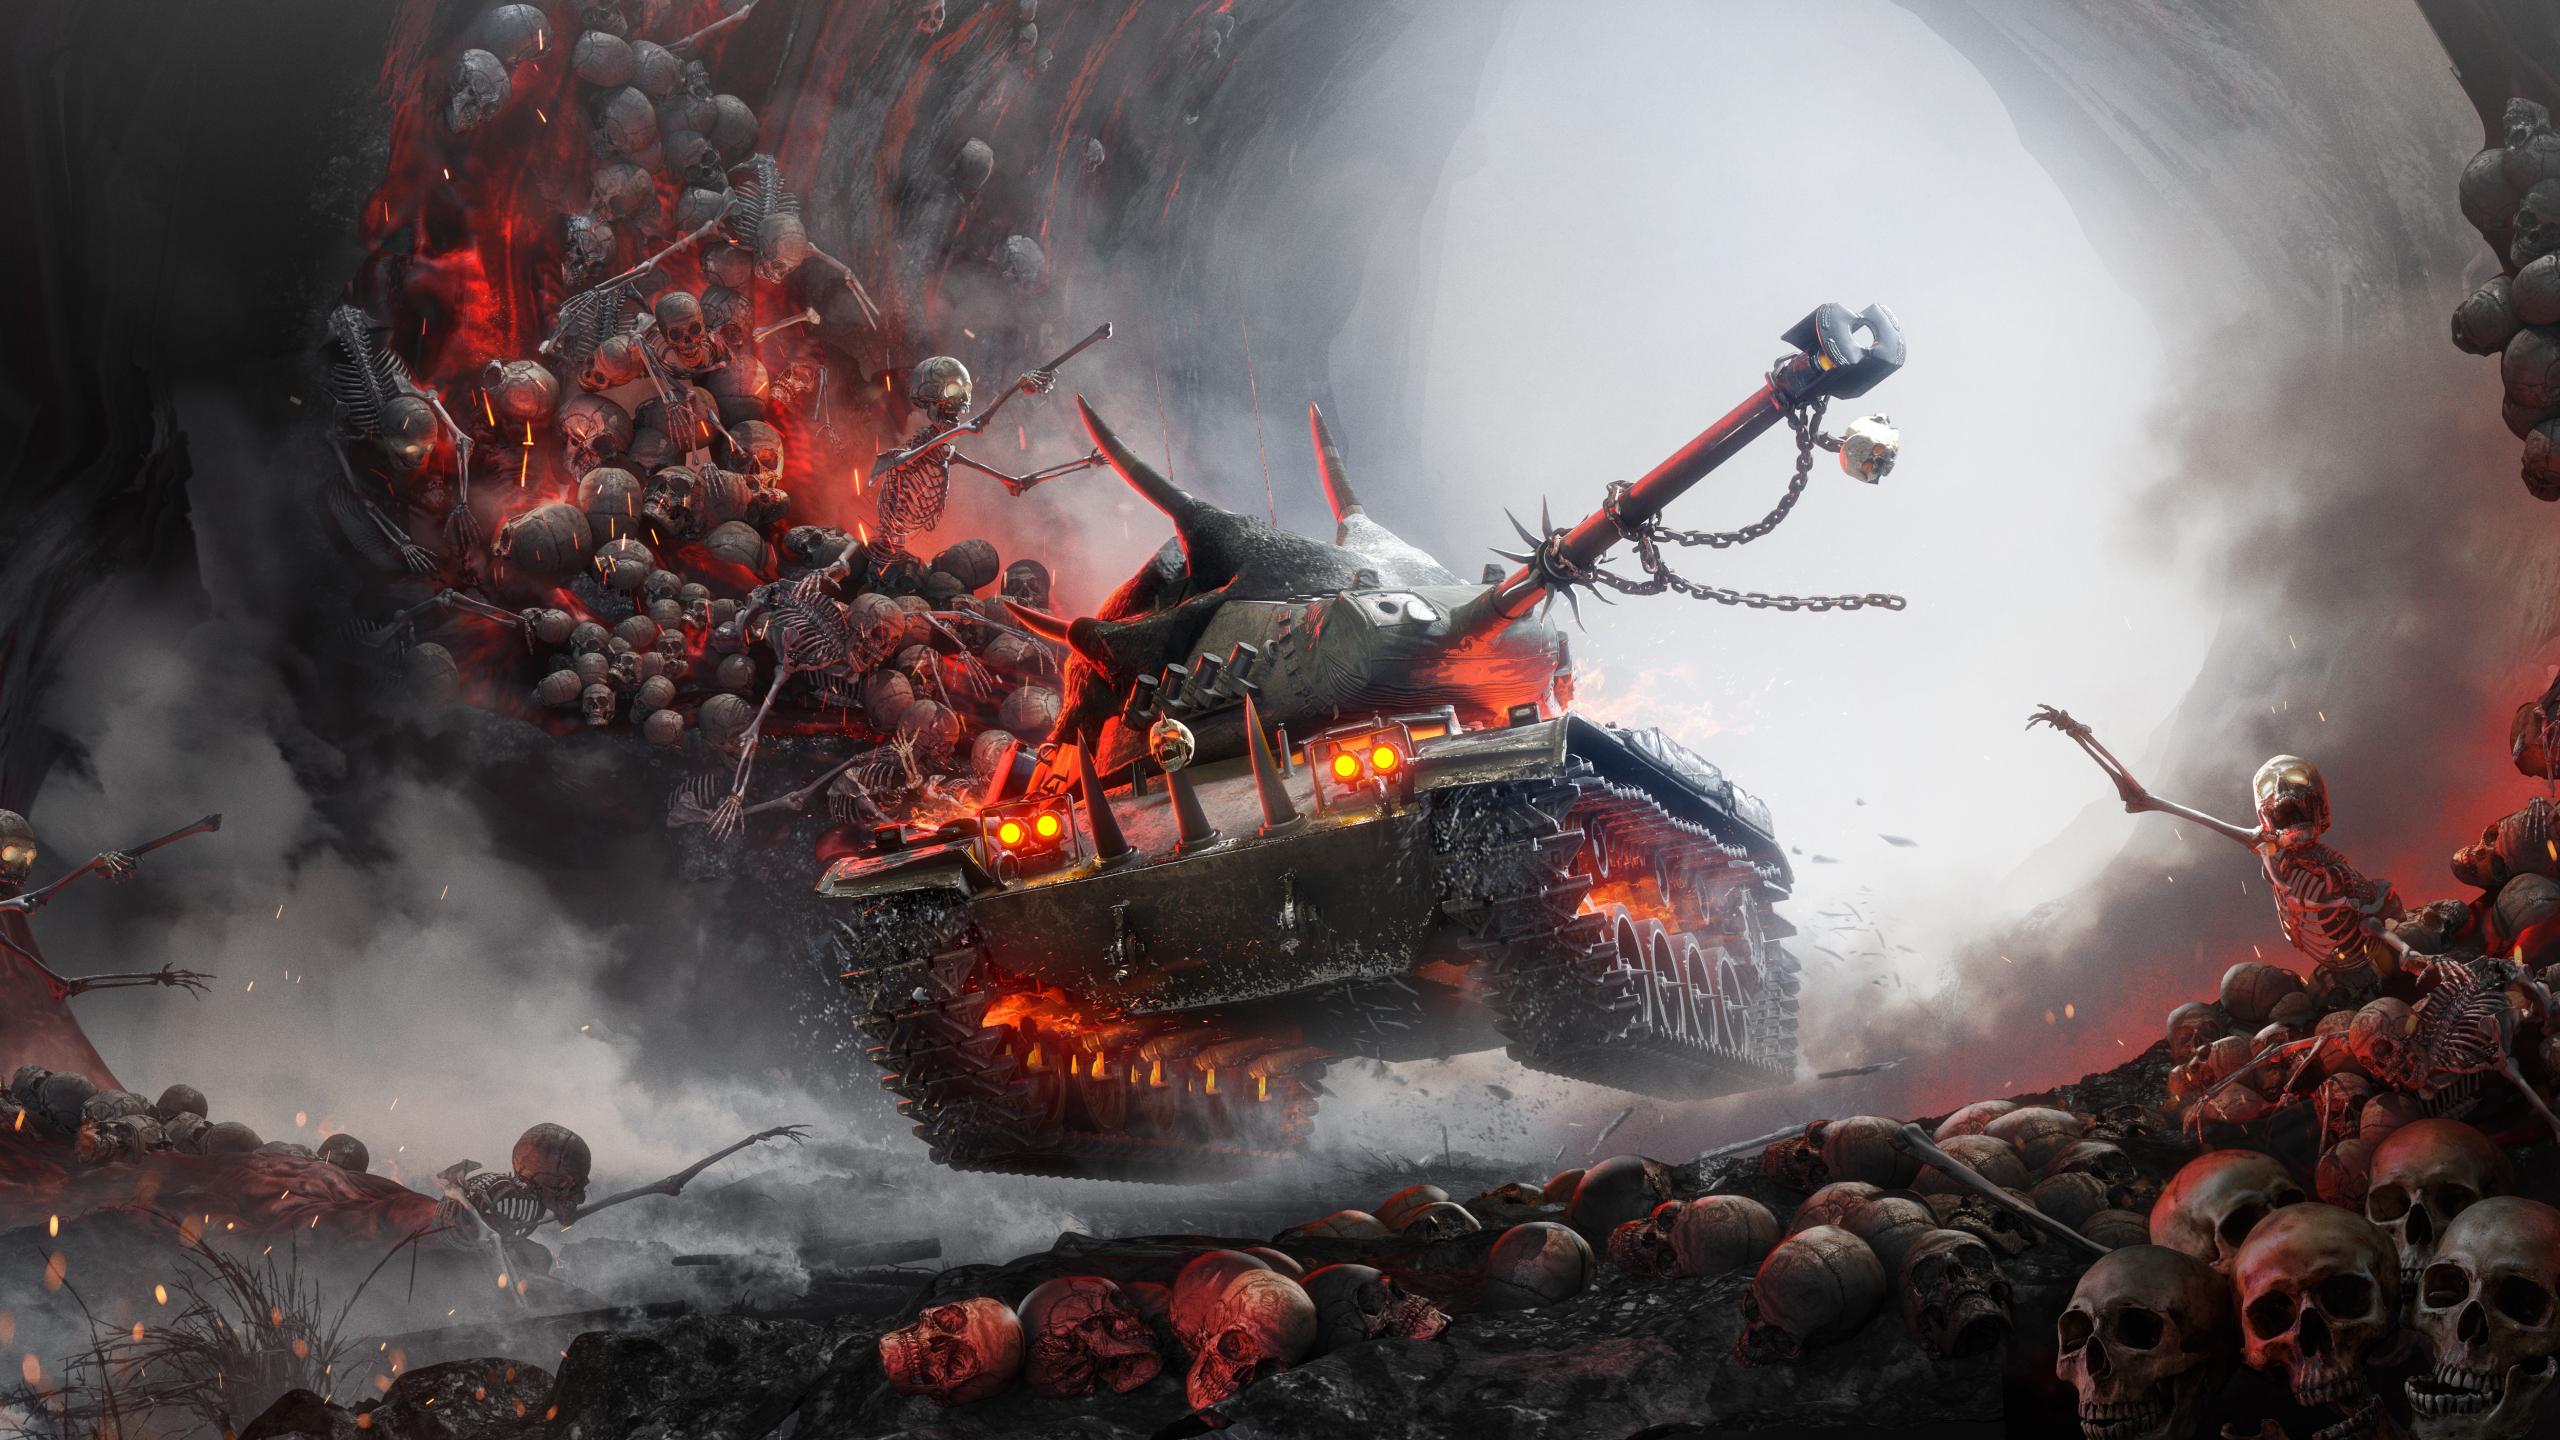 Download 2560x1440 Wallpaper World Of Tanks Online Game Skulls Dual Wide Widescreen 16 9 Widescreen 2560x1440 Hd Image Background 14914